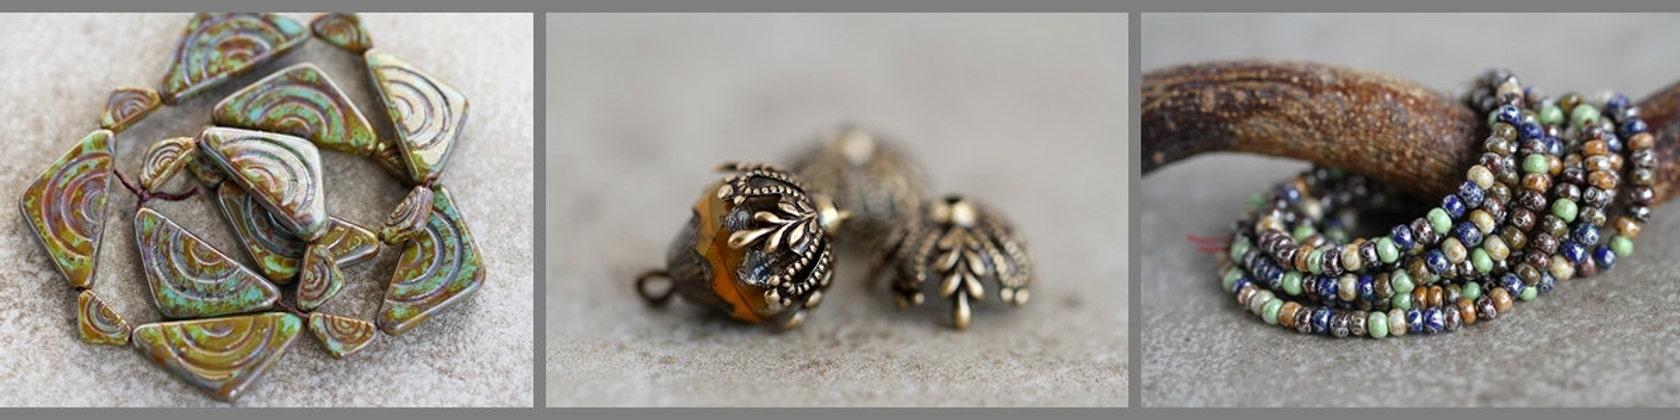 602982bb0410 Czech glass beads professional quality de BeadsandmorebyYashma